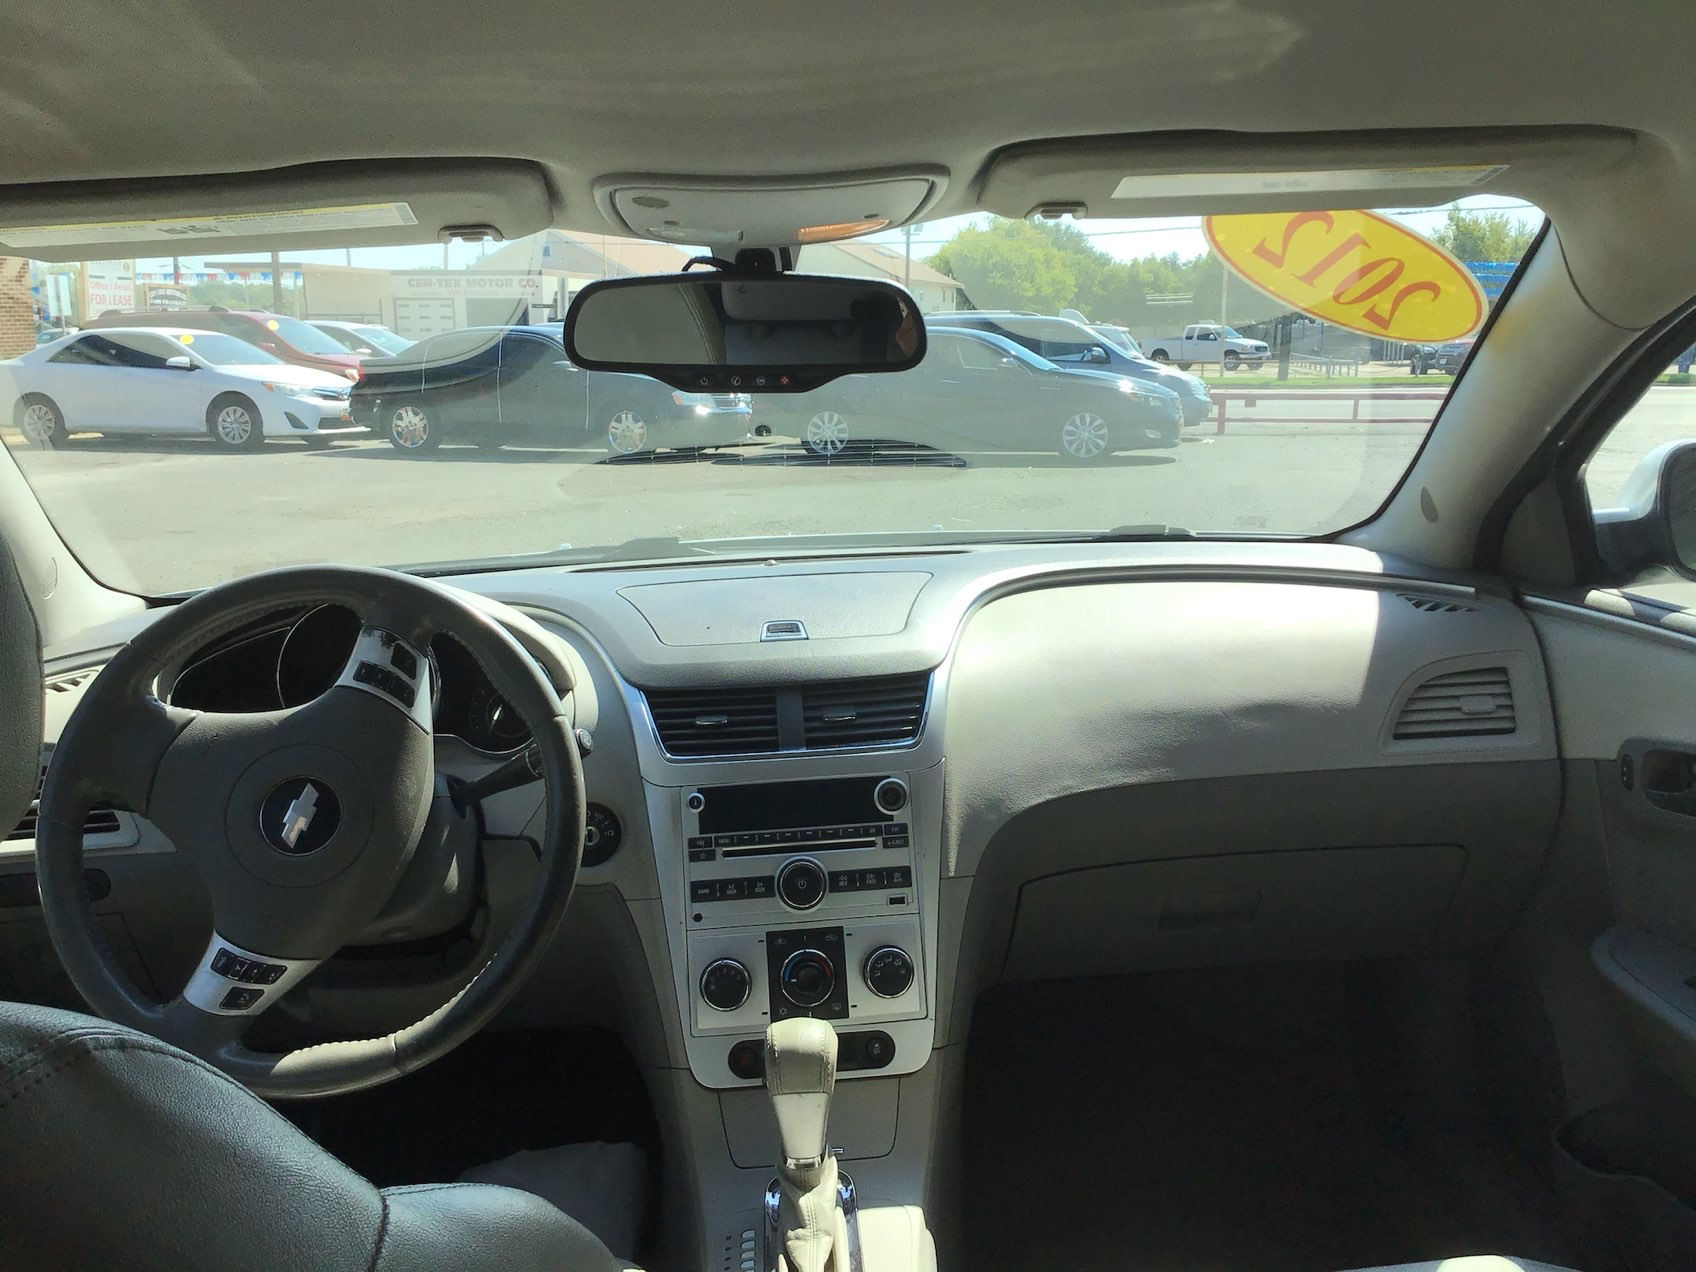 used vehicle - 4 DOOR SEDAN CHEVROLET MALIBU 2012